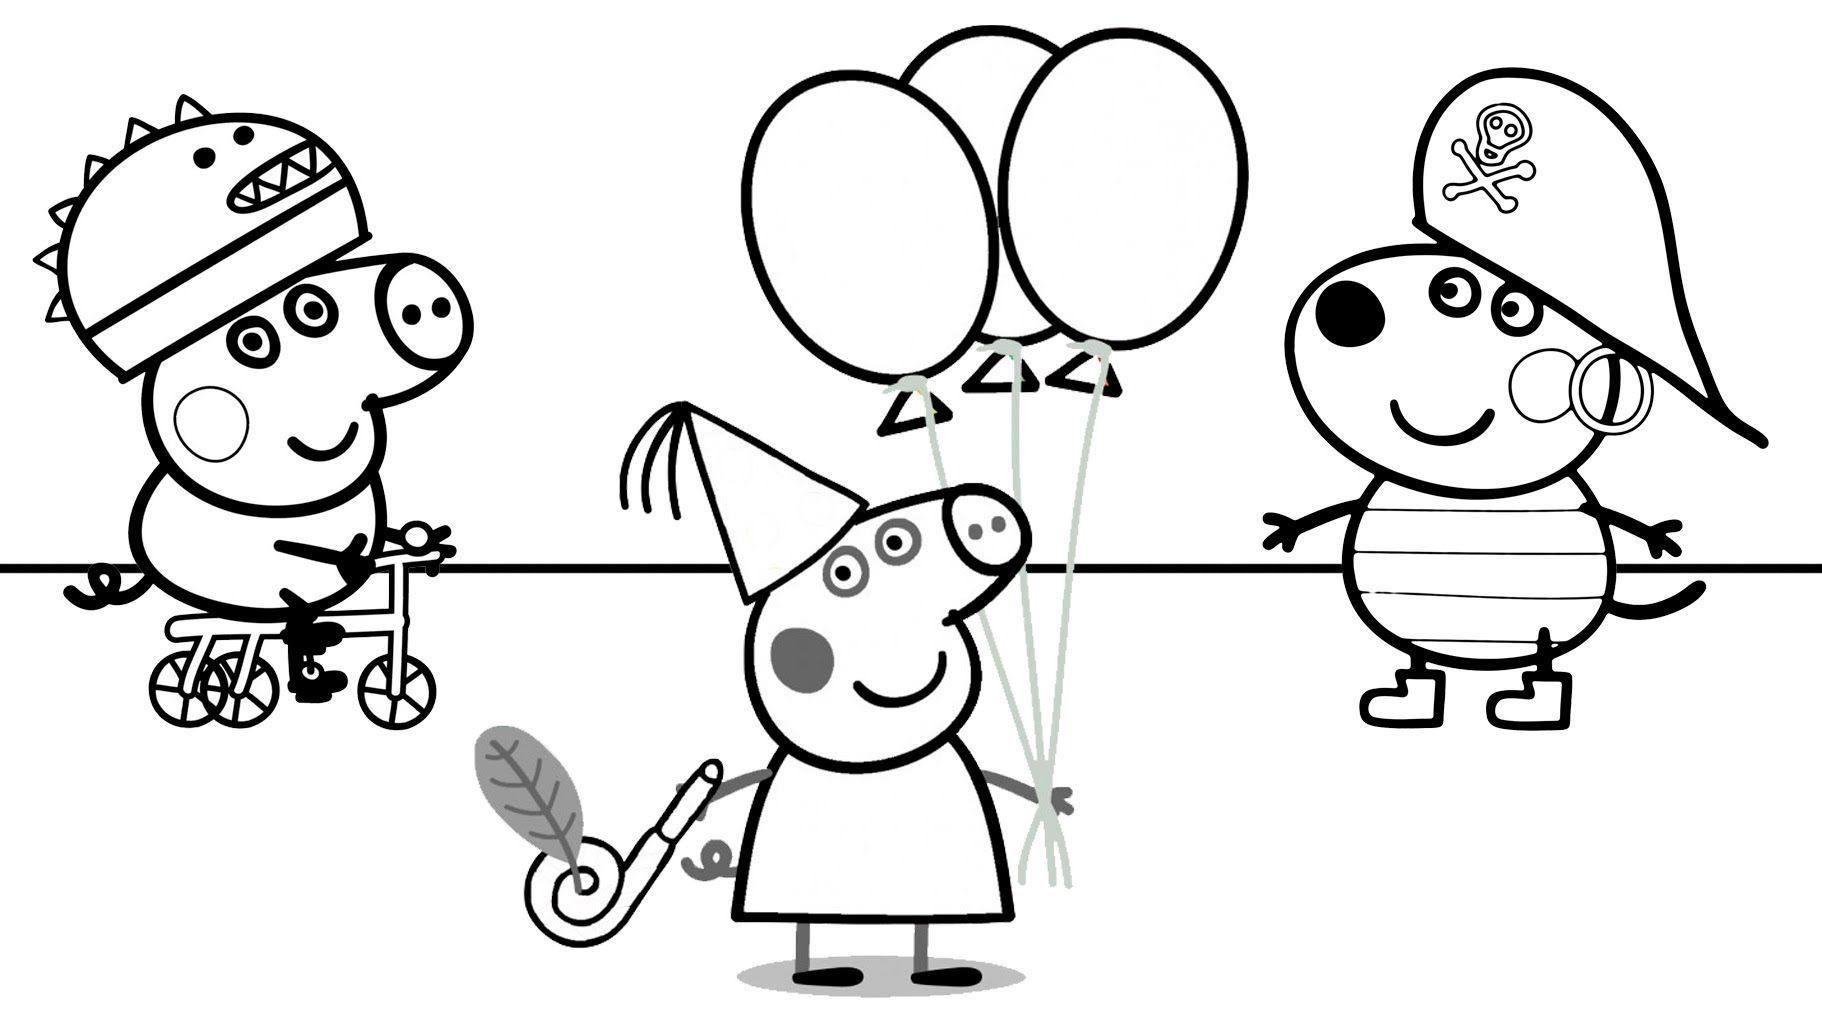 Dibujos Para Colorear Peppa Pig Halloween Imagesacolorierwebsite